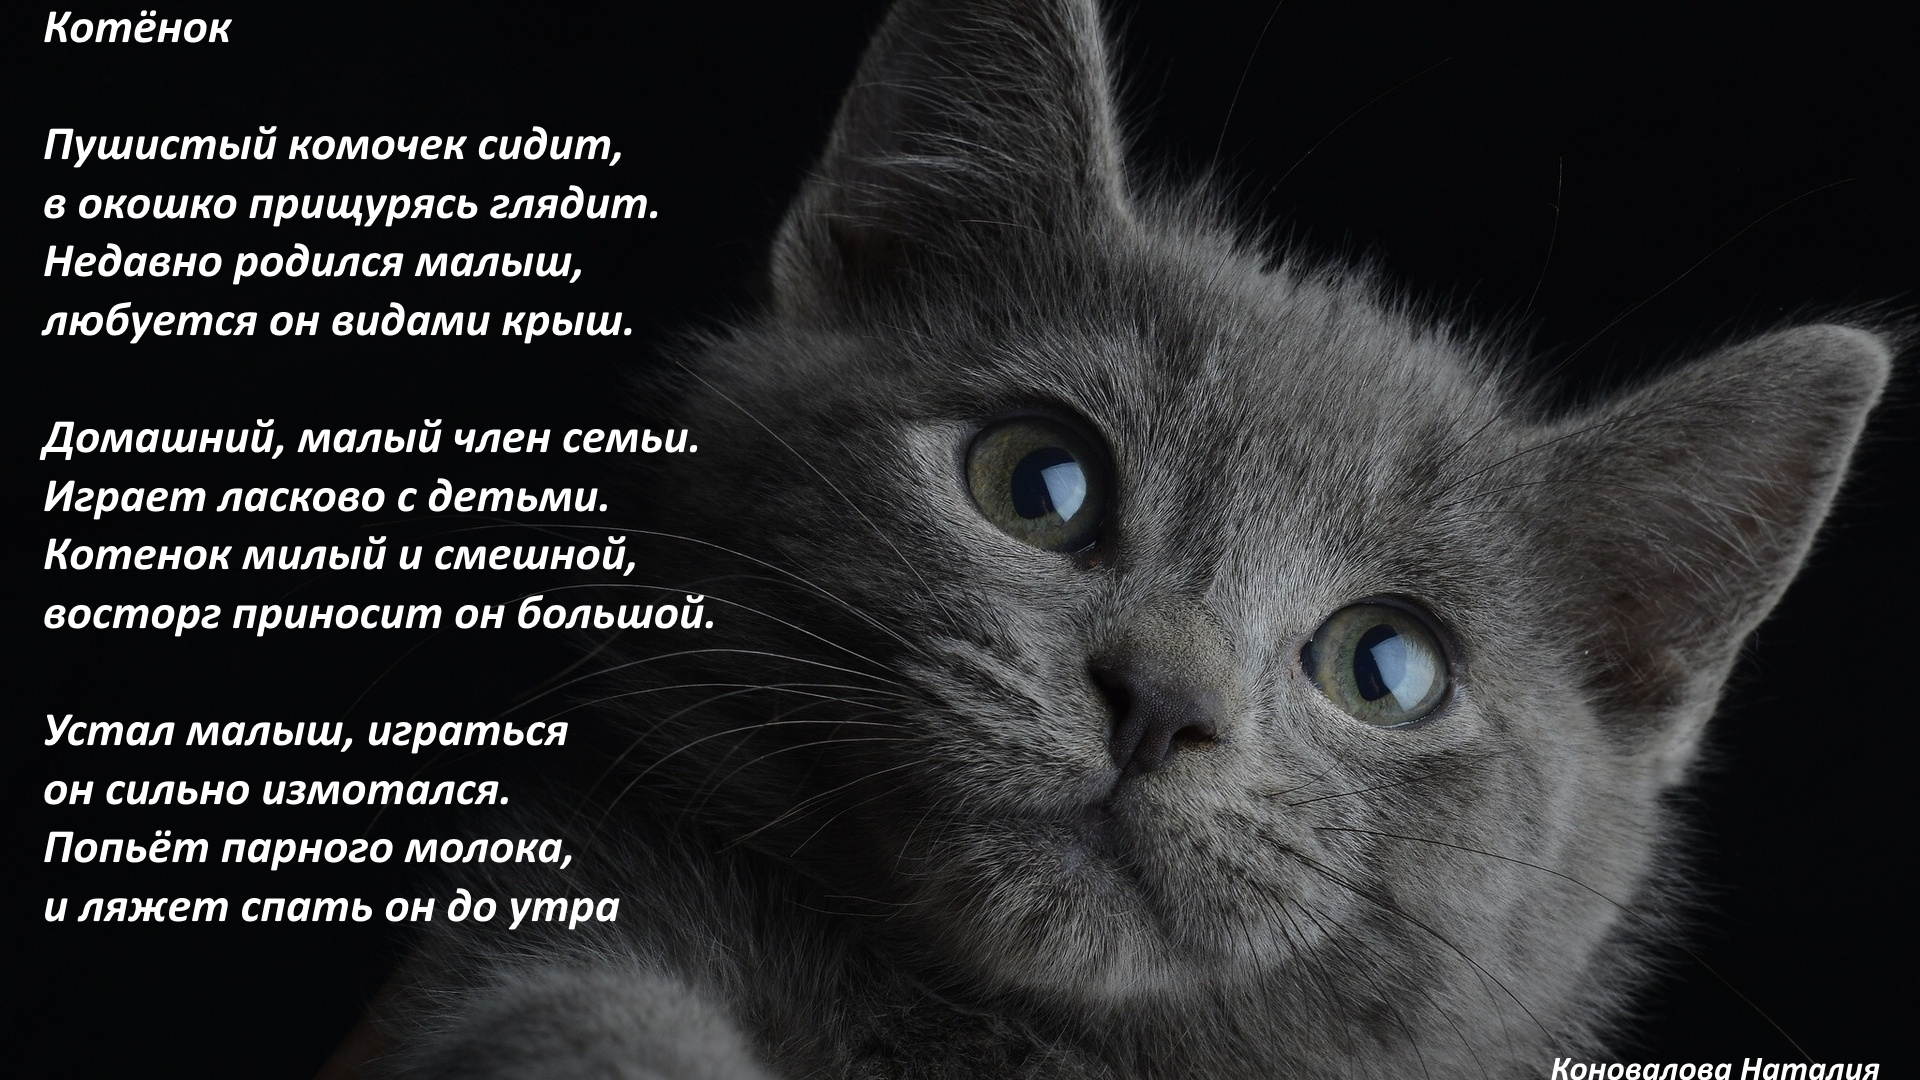 Кошки картинки с стихами